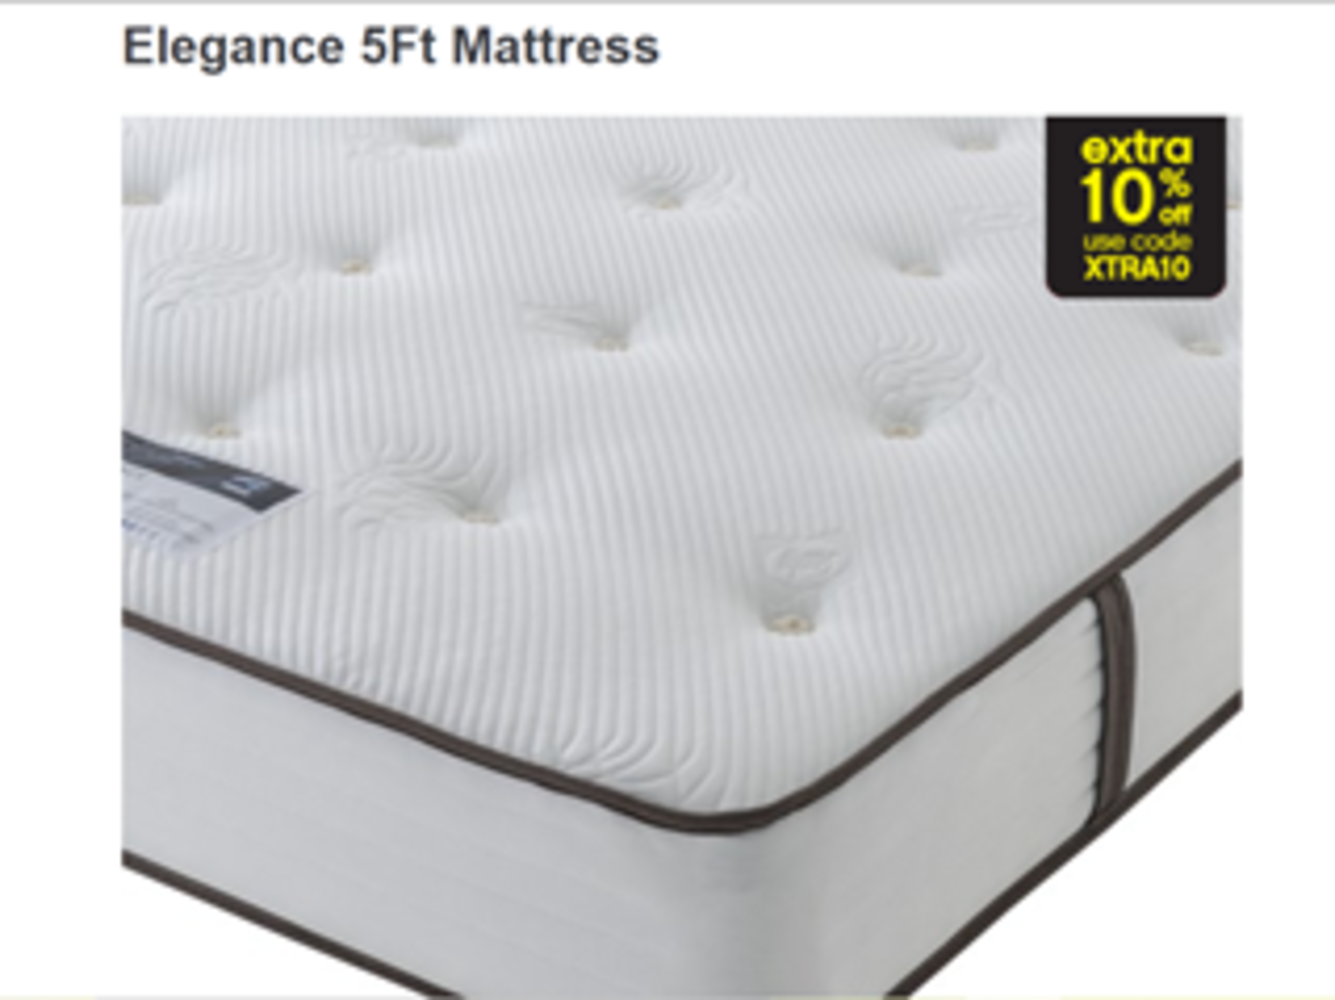 *MEGA MATTRESS & BED SALE* WITH EX-DISPLAY CARPET RIGHT COMPLETE BEDS, MATTRESSES, HEADBOARDS & HUGE RANGE OF REFURBISHED NECTAR MATTRESSES